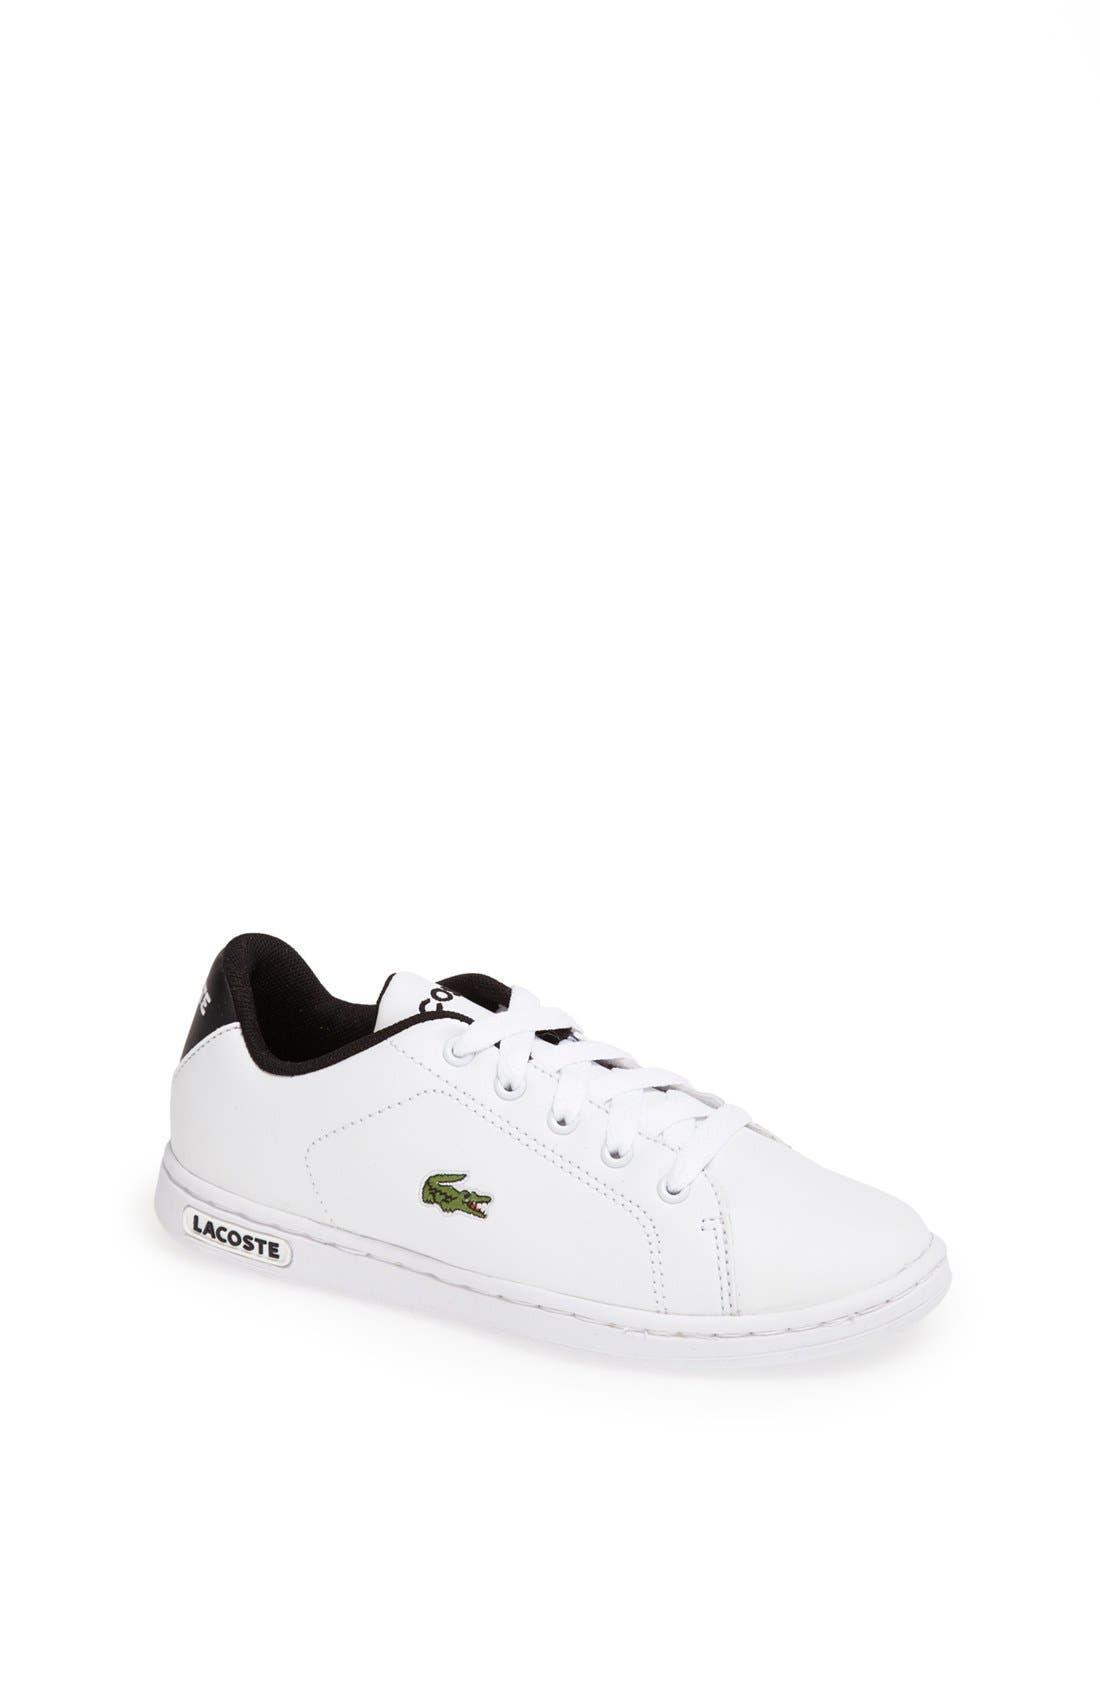 Alternate Image 1 Selected - Lacoste 'Carnaby' Sneaker (Baby, Walker, Toddler, Little Kid & Big Kid)